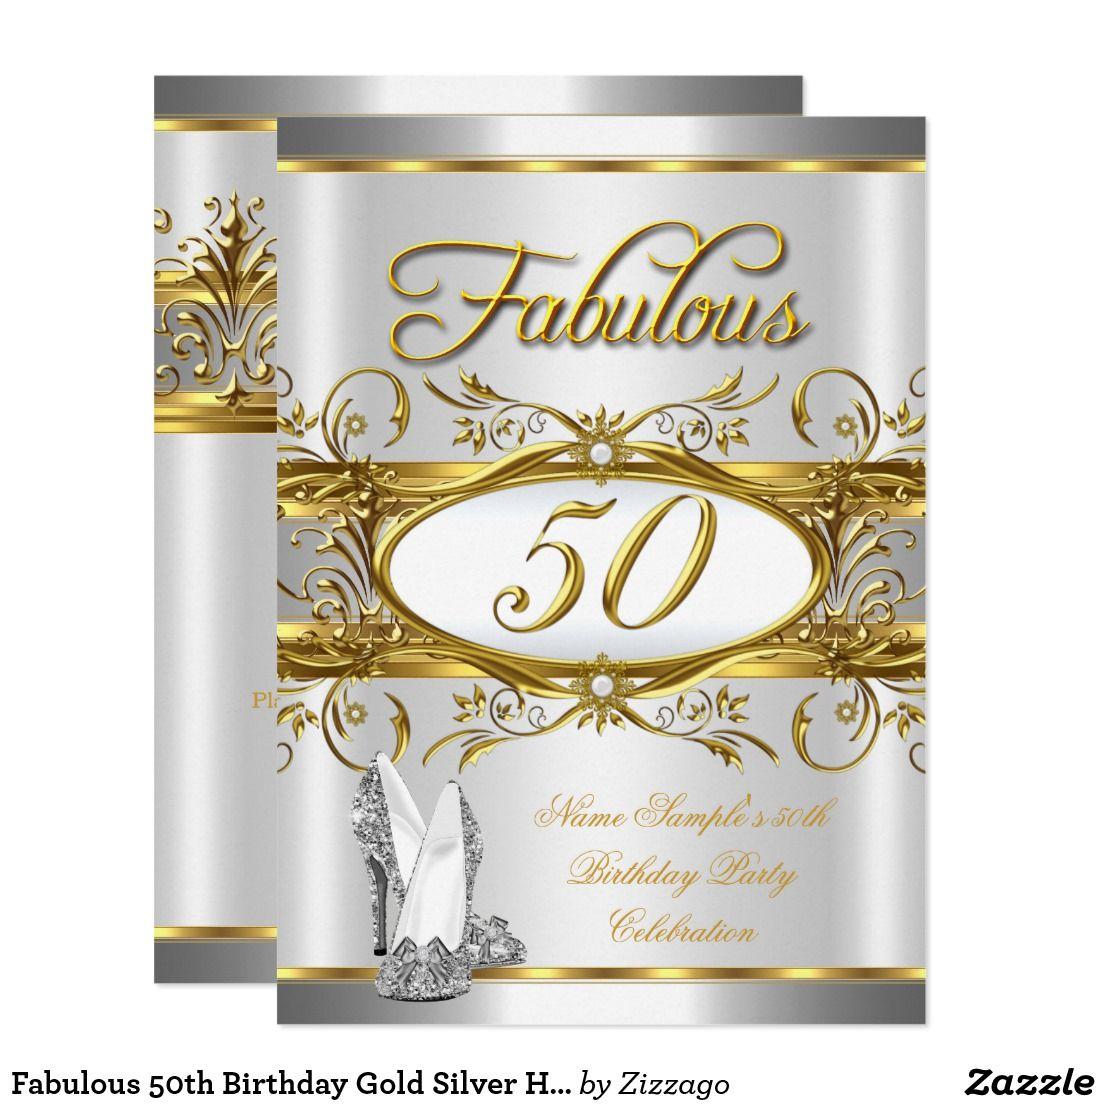 Fabulous 50th Birthday Gold Silver High Heels Invitation | Pinterest ...